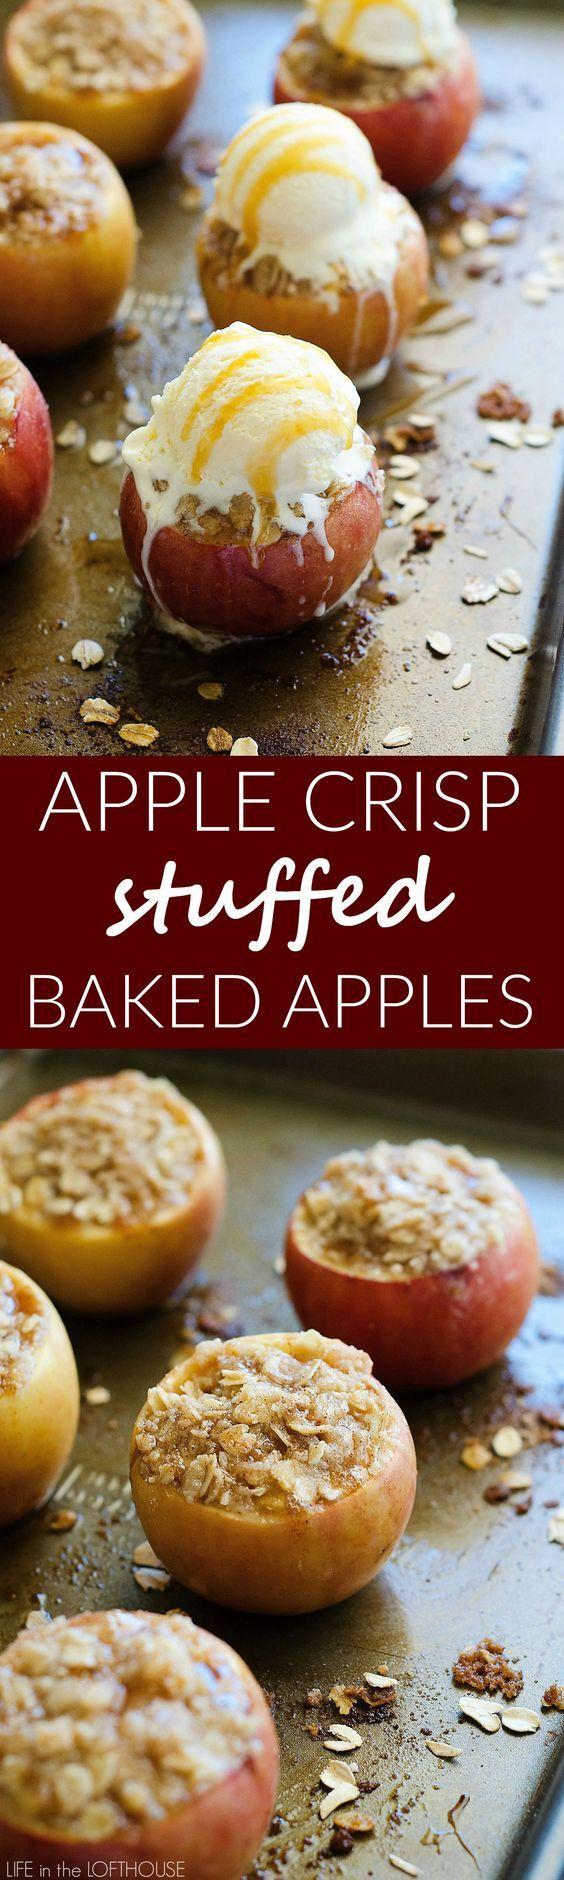 Apple crisp, Baked apples and Ice on Pinterest